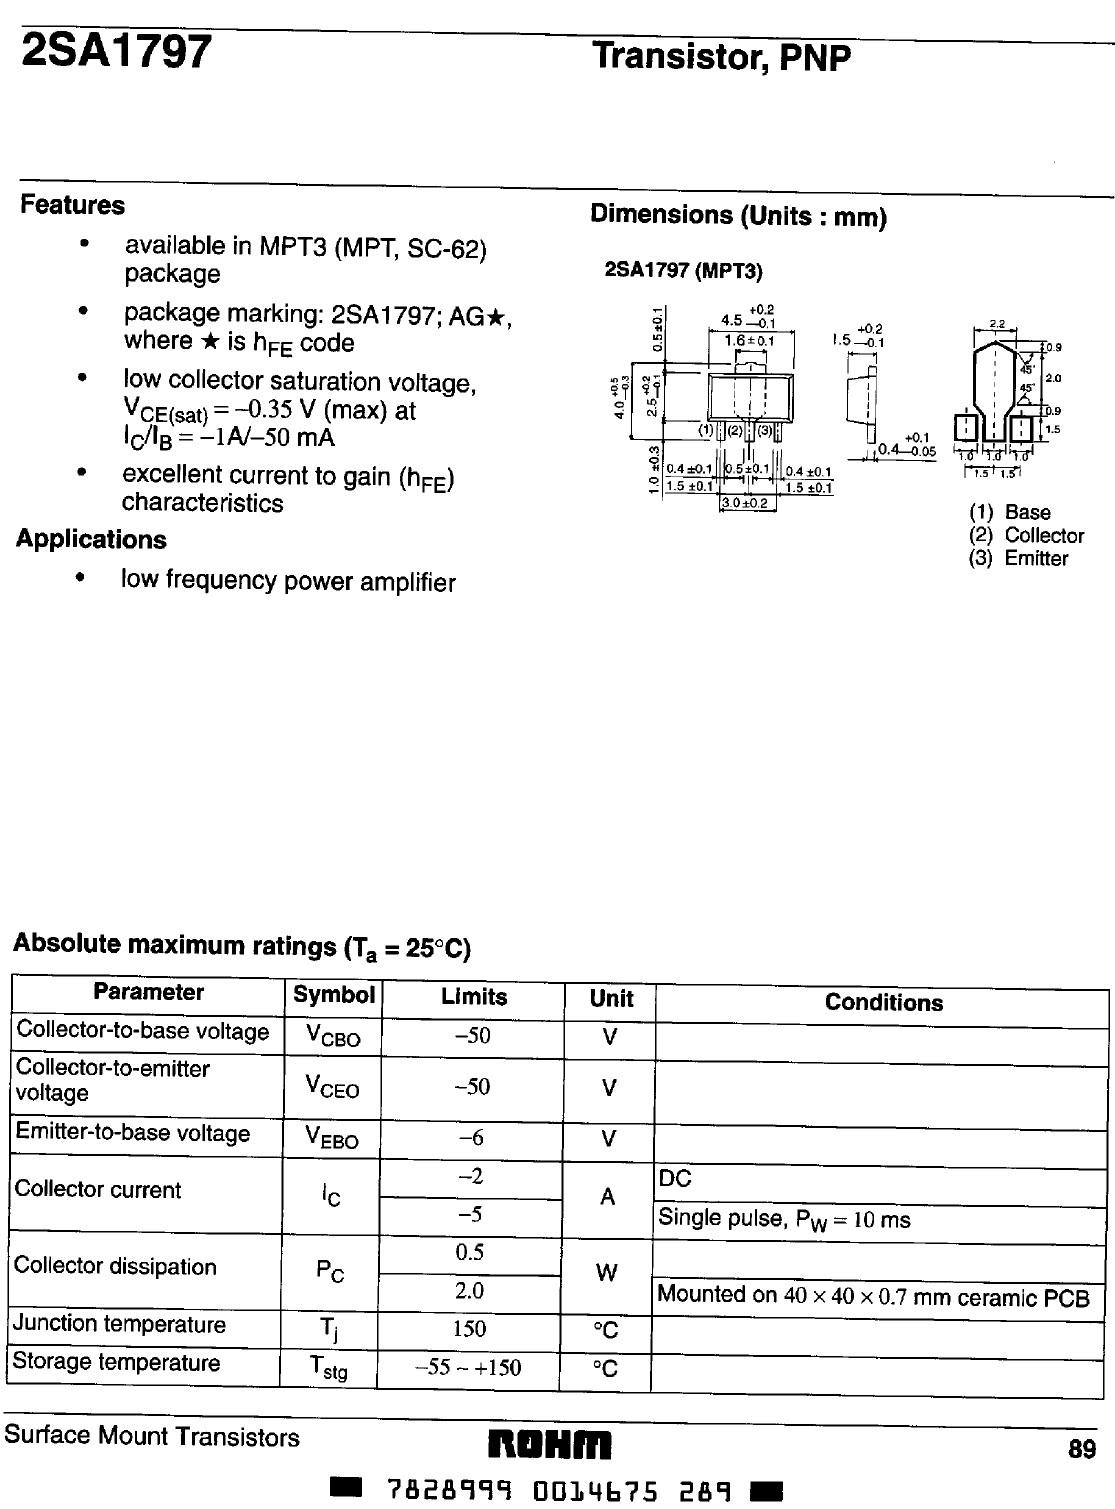 Tranzisztor PNP 50/50V 2A/5A 0.5W 200MHz SMD 2SA1797Q 2SA1797Q -